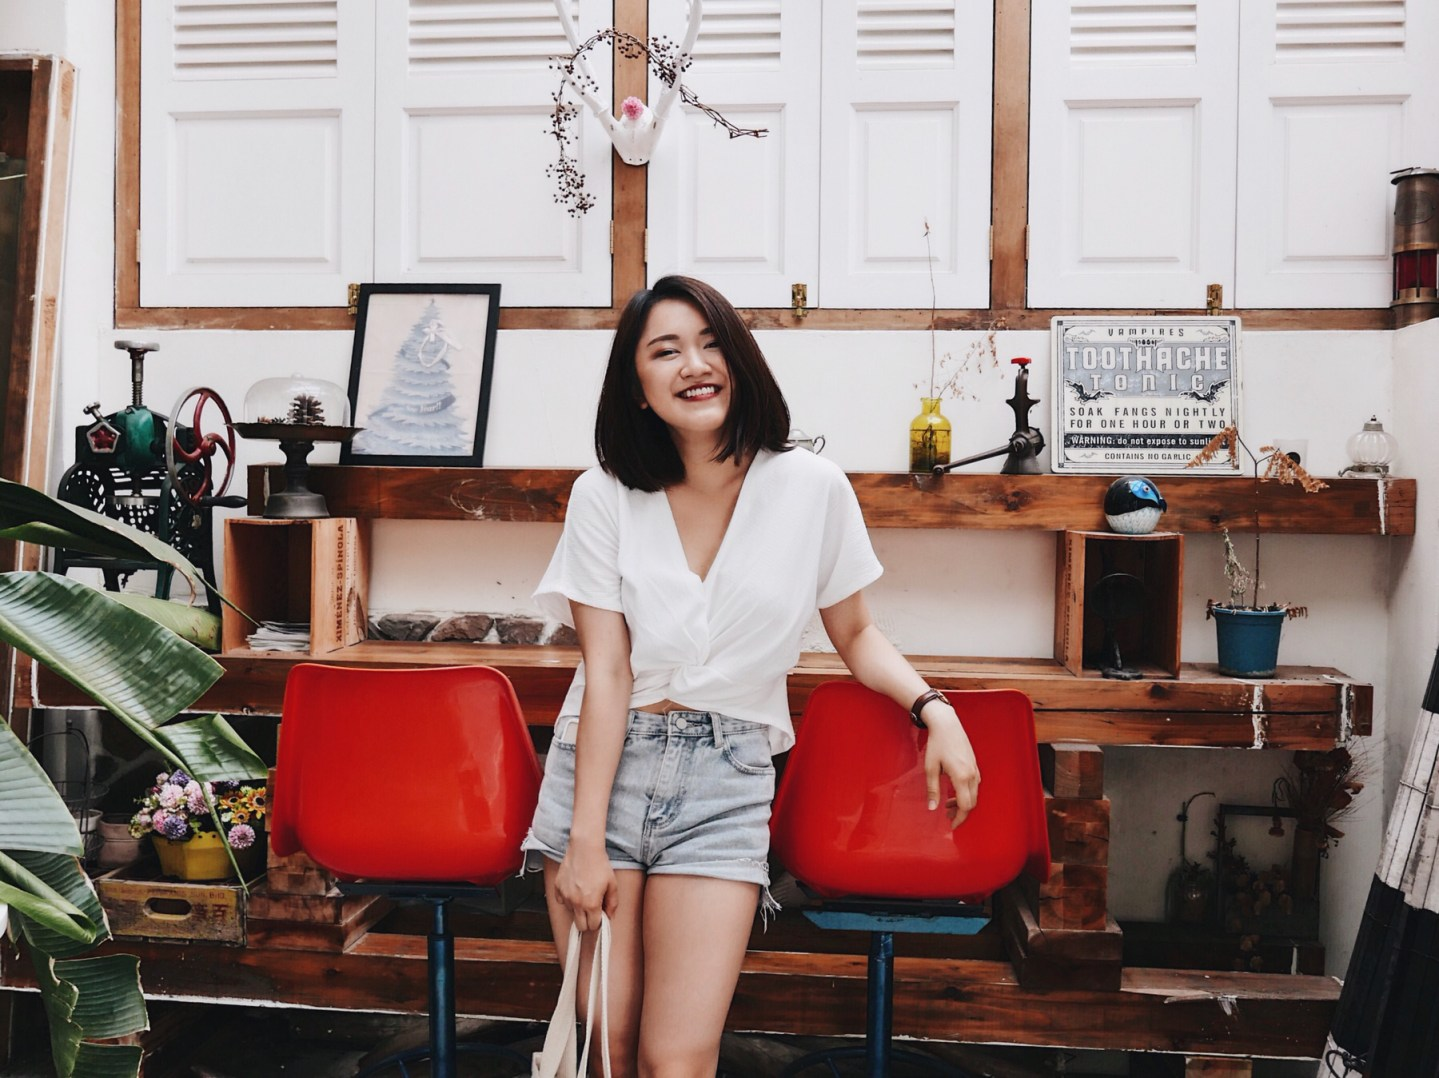 Interview|「只要相信自己在做的事,別人也會跟著相信你。」Z世代才女,用文字與影像訴說另一種生活的可能——Iris Huang 專訪